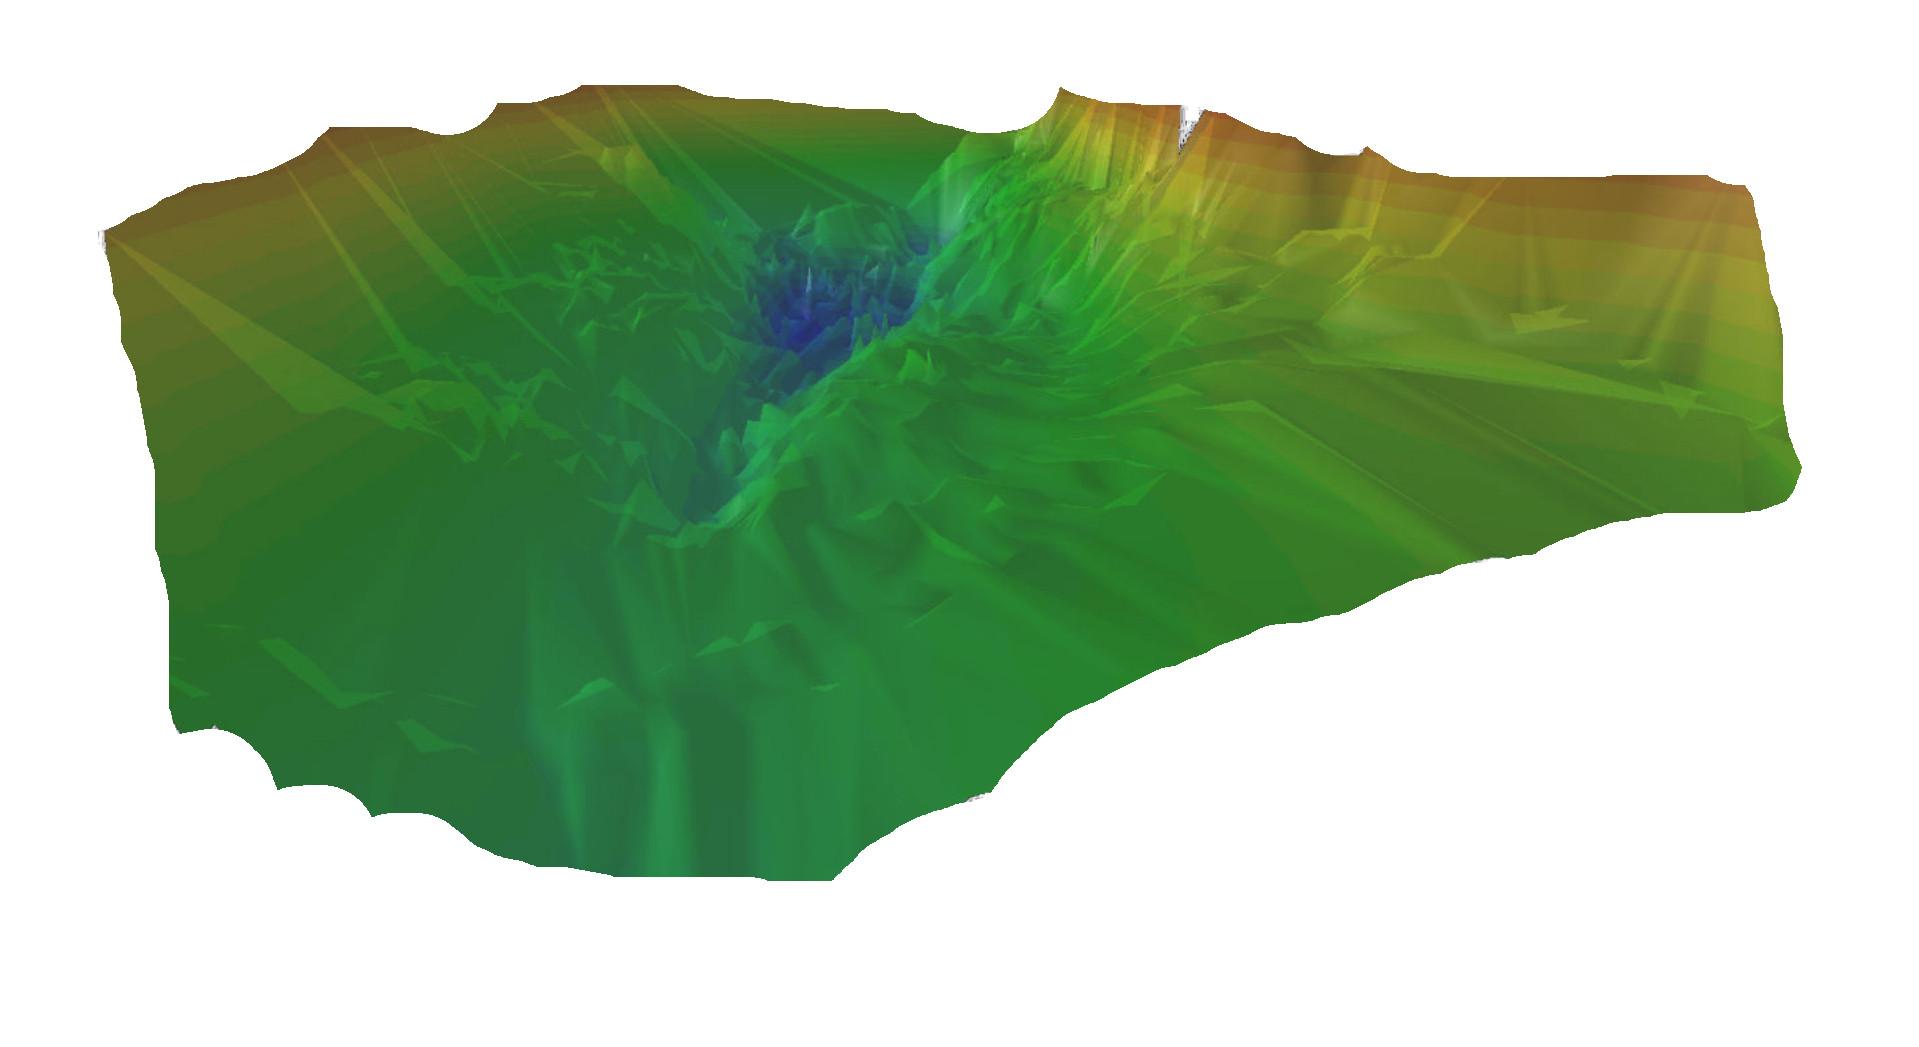 River Bed Hydrographic Innovair1.jpg